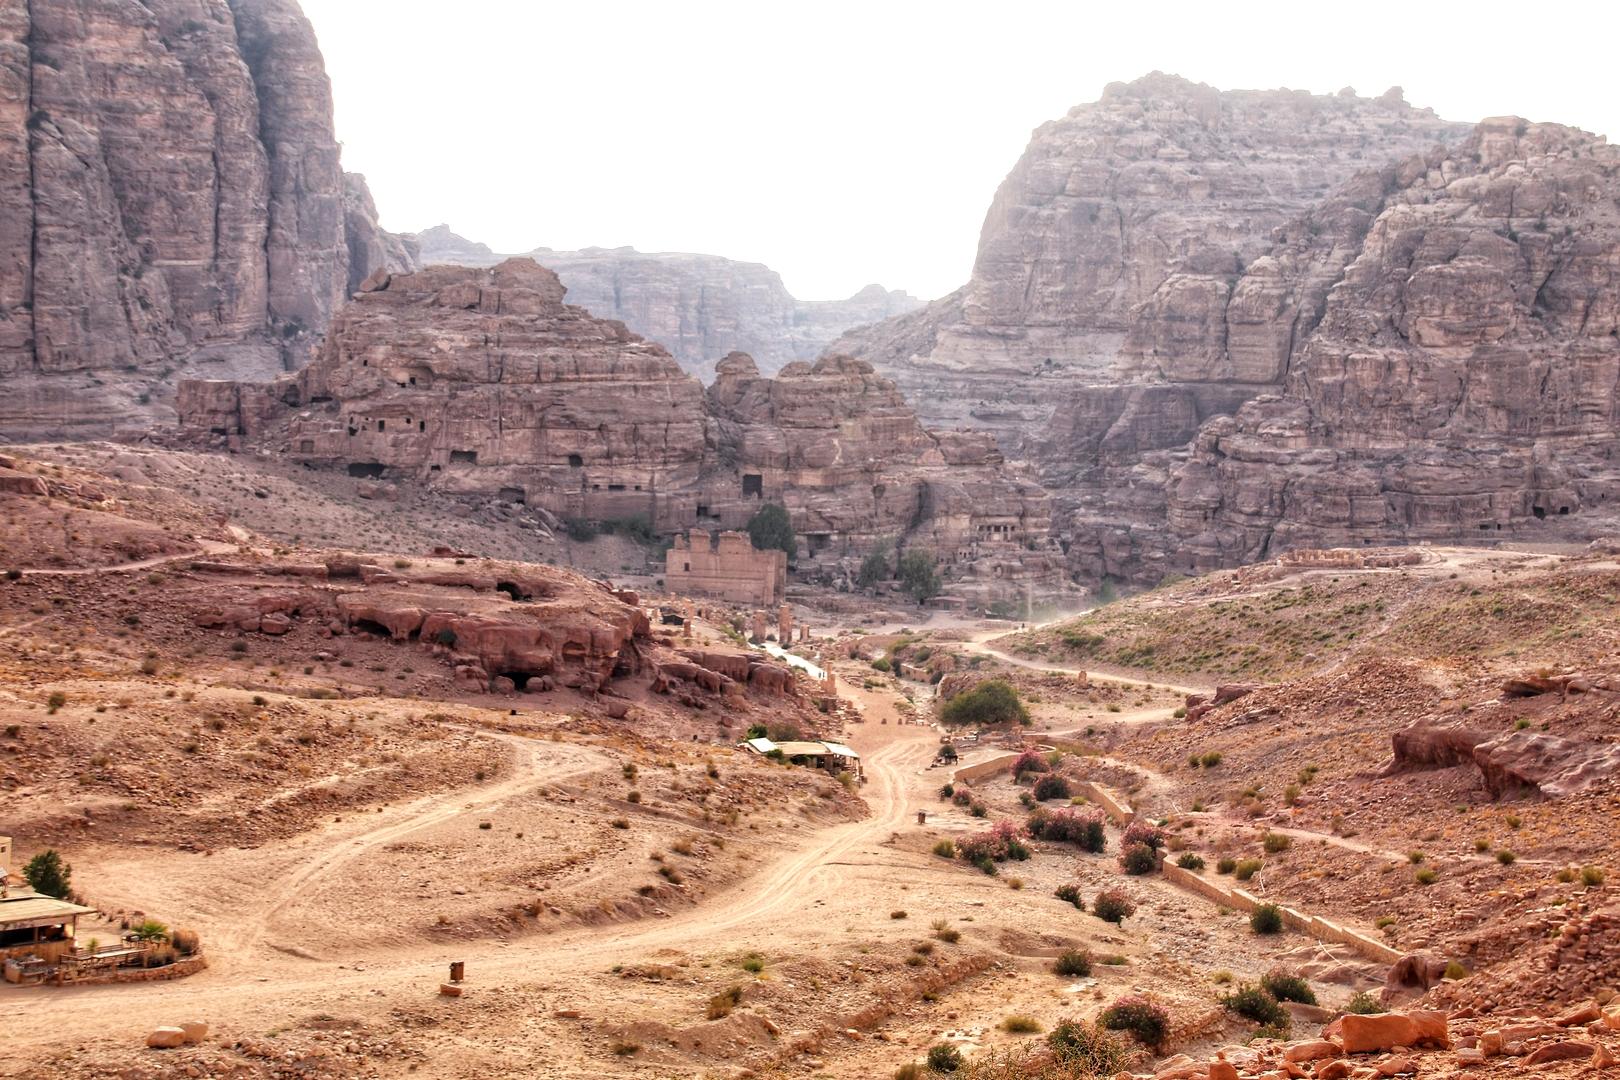 Jordanie - Les tombes royales de Petra